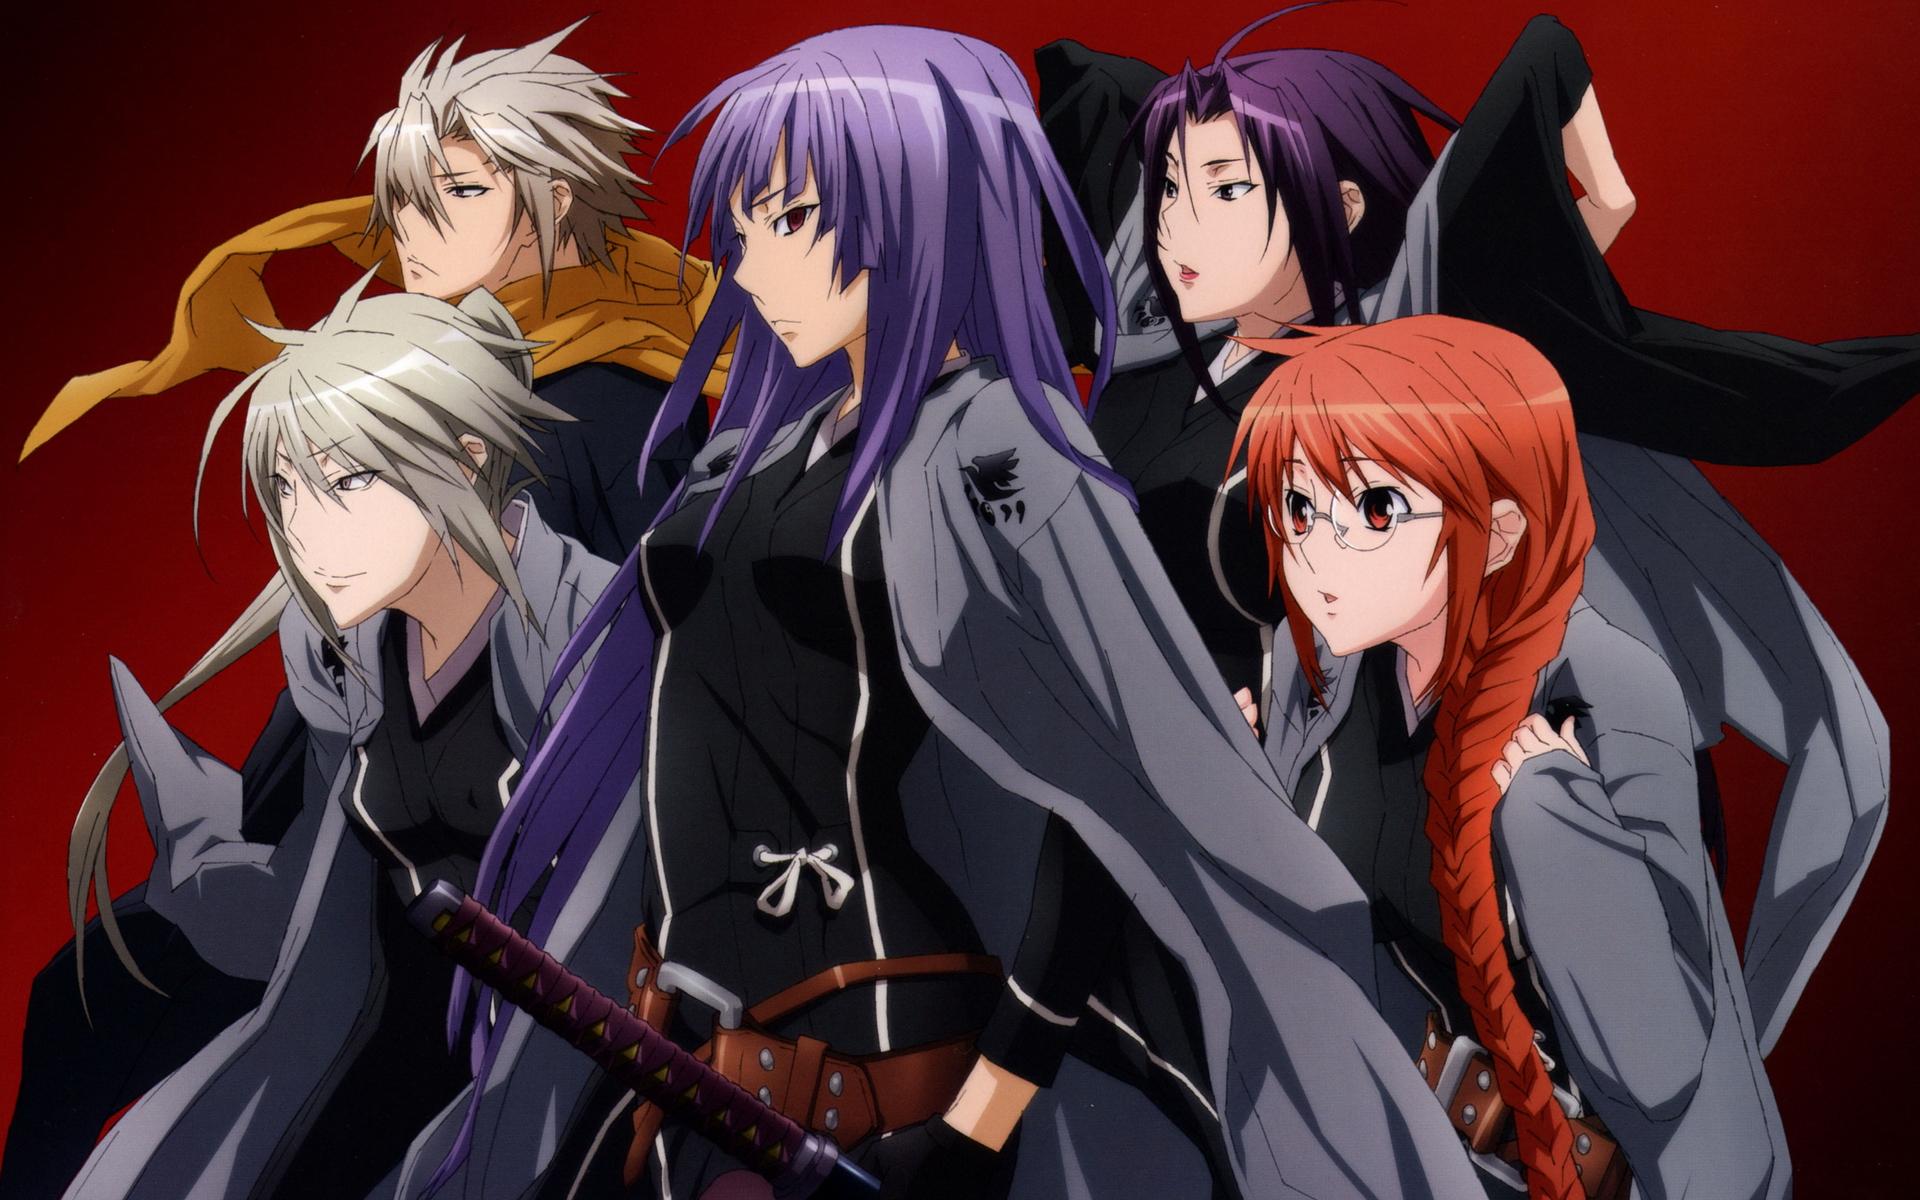 Картинки с персонажами аниме